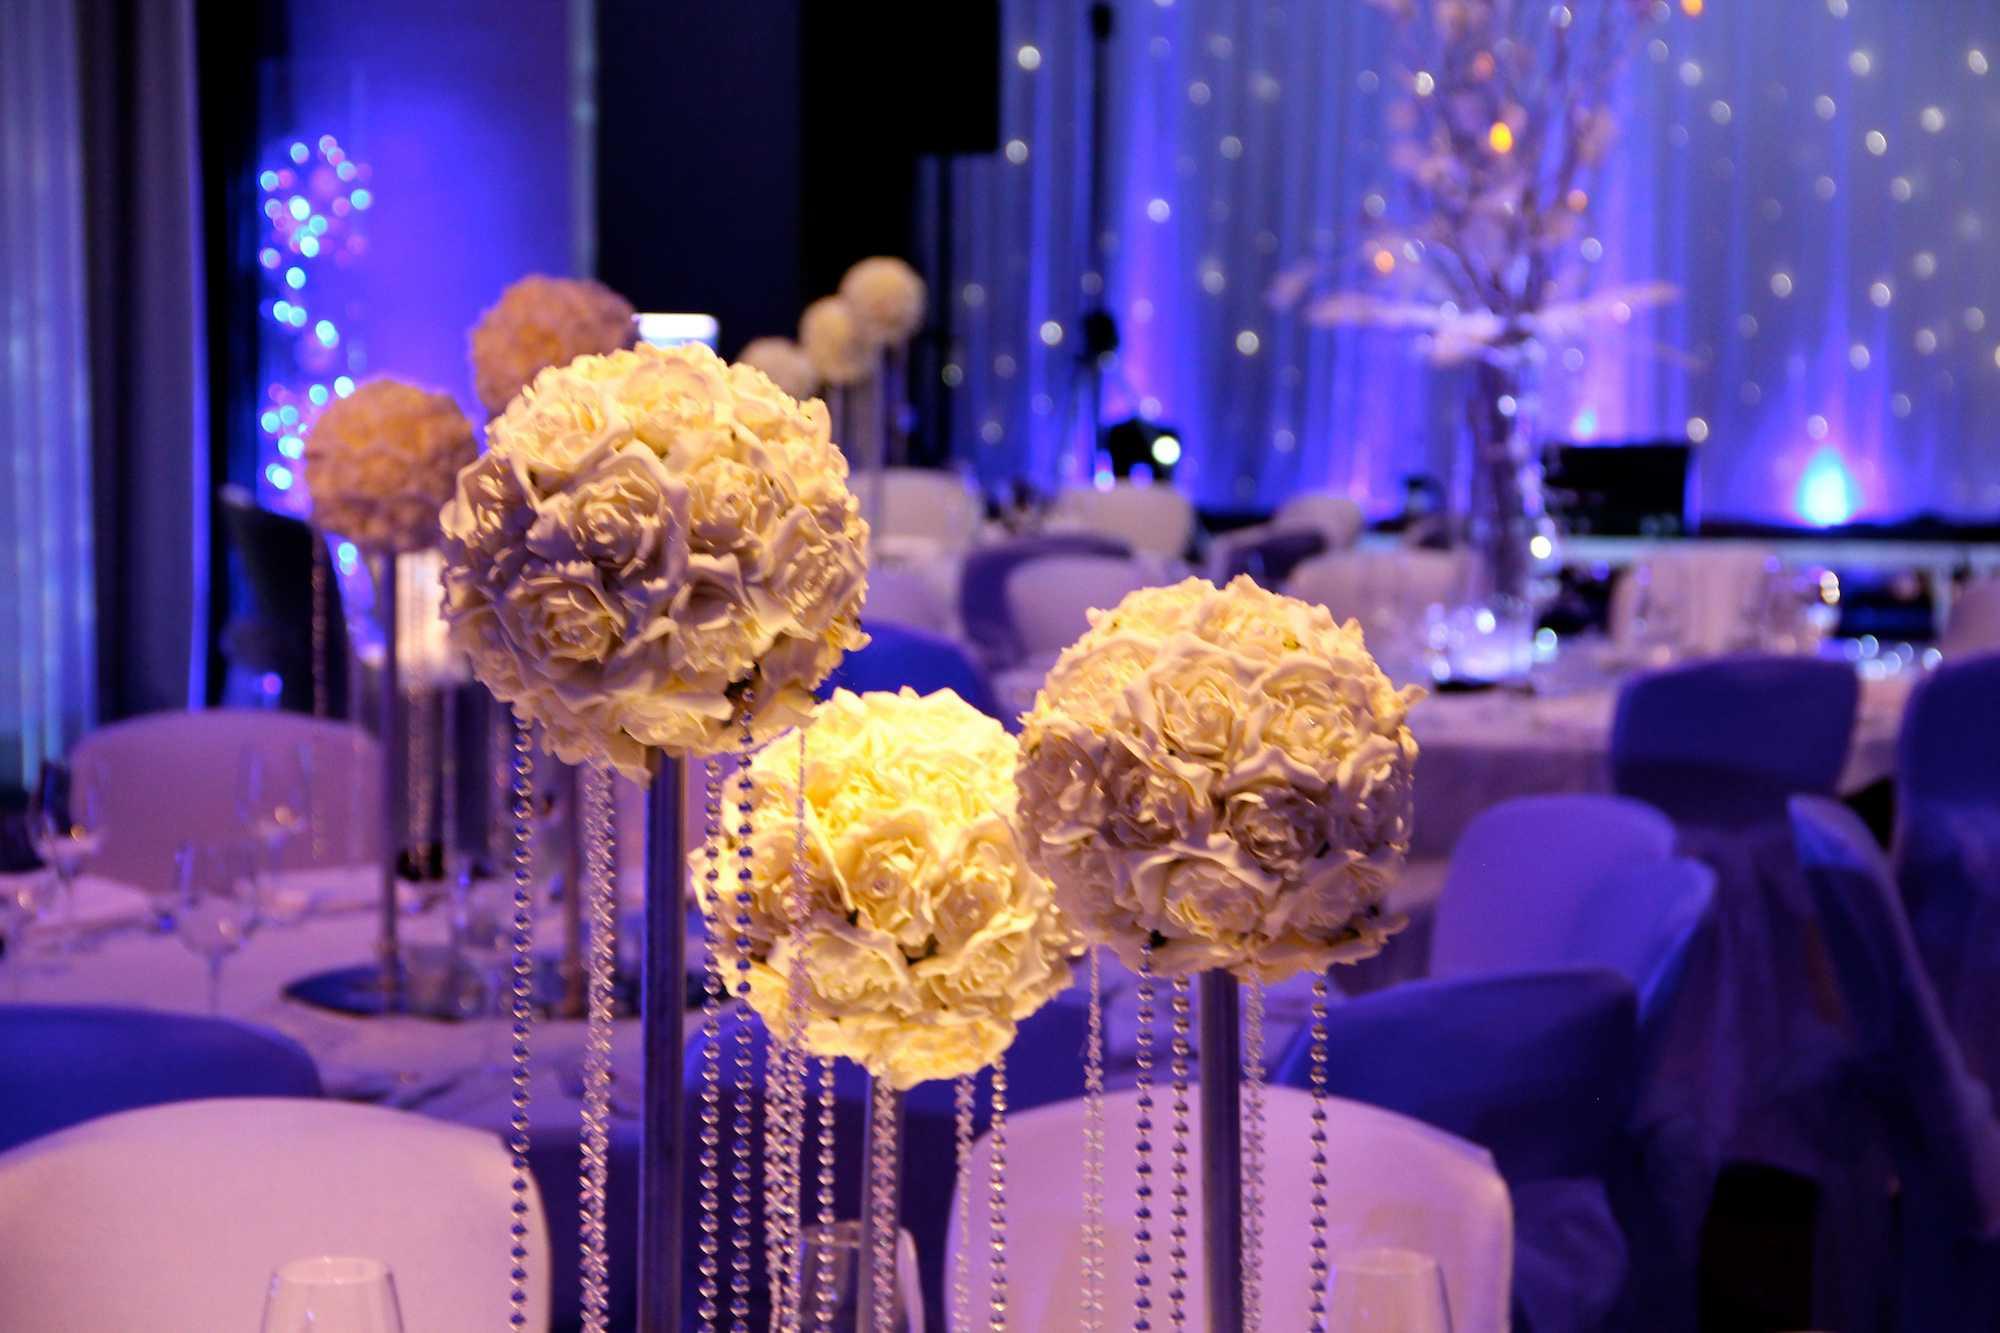 Winter Wonderland Themed Wedding Lighting & Venue Dressing at Hilton Hotel Liverpool. Blue Uplighters, Snowflake Gobos, Winter Wonderland Theme Props.